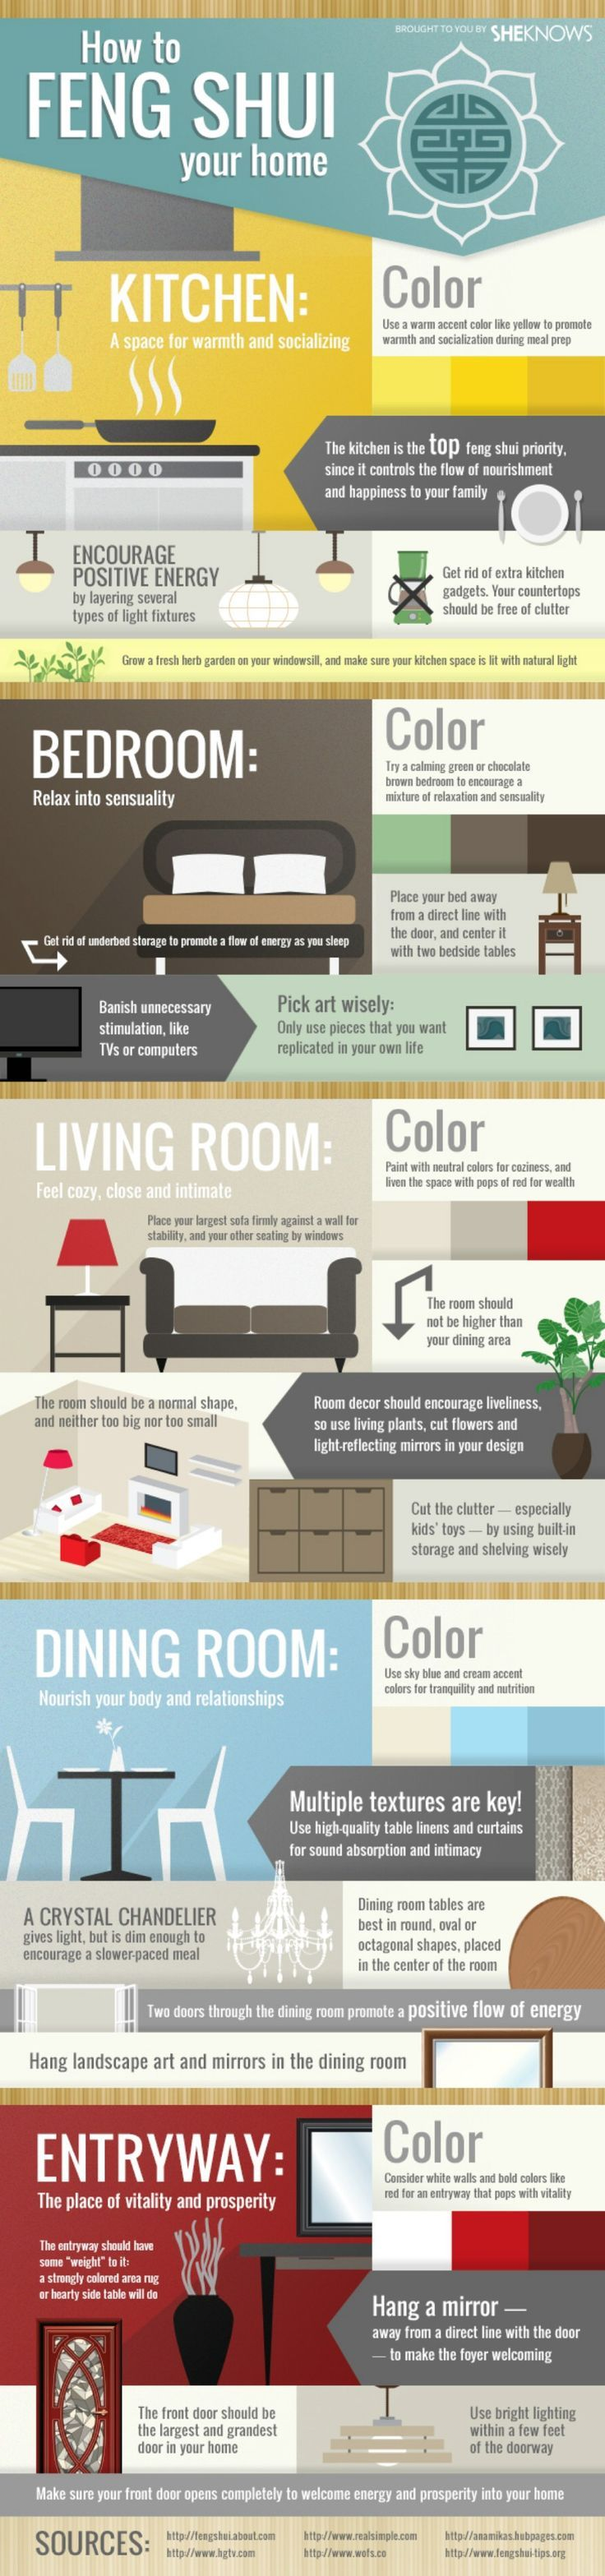 Master bedroom as per vastu shastra   best home renovations images on Pinterest  Home ideas Living